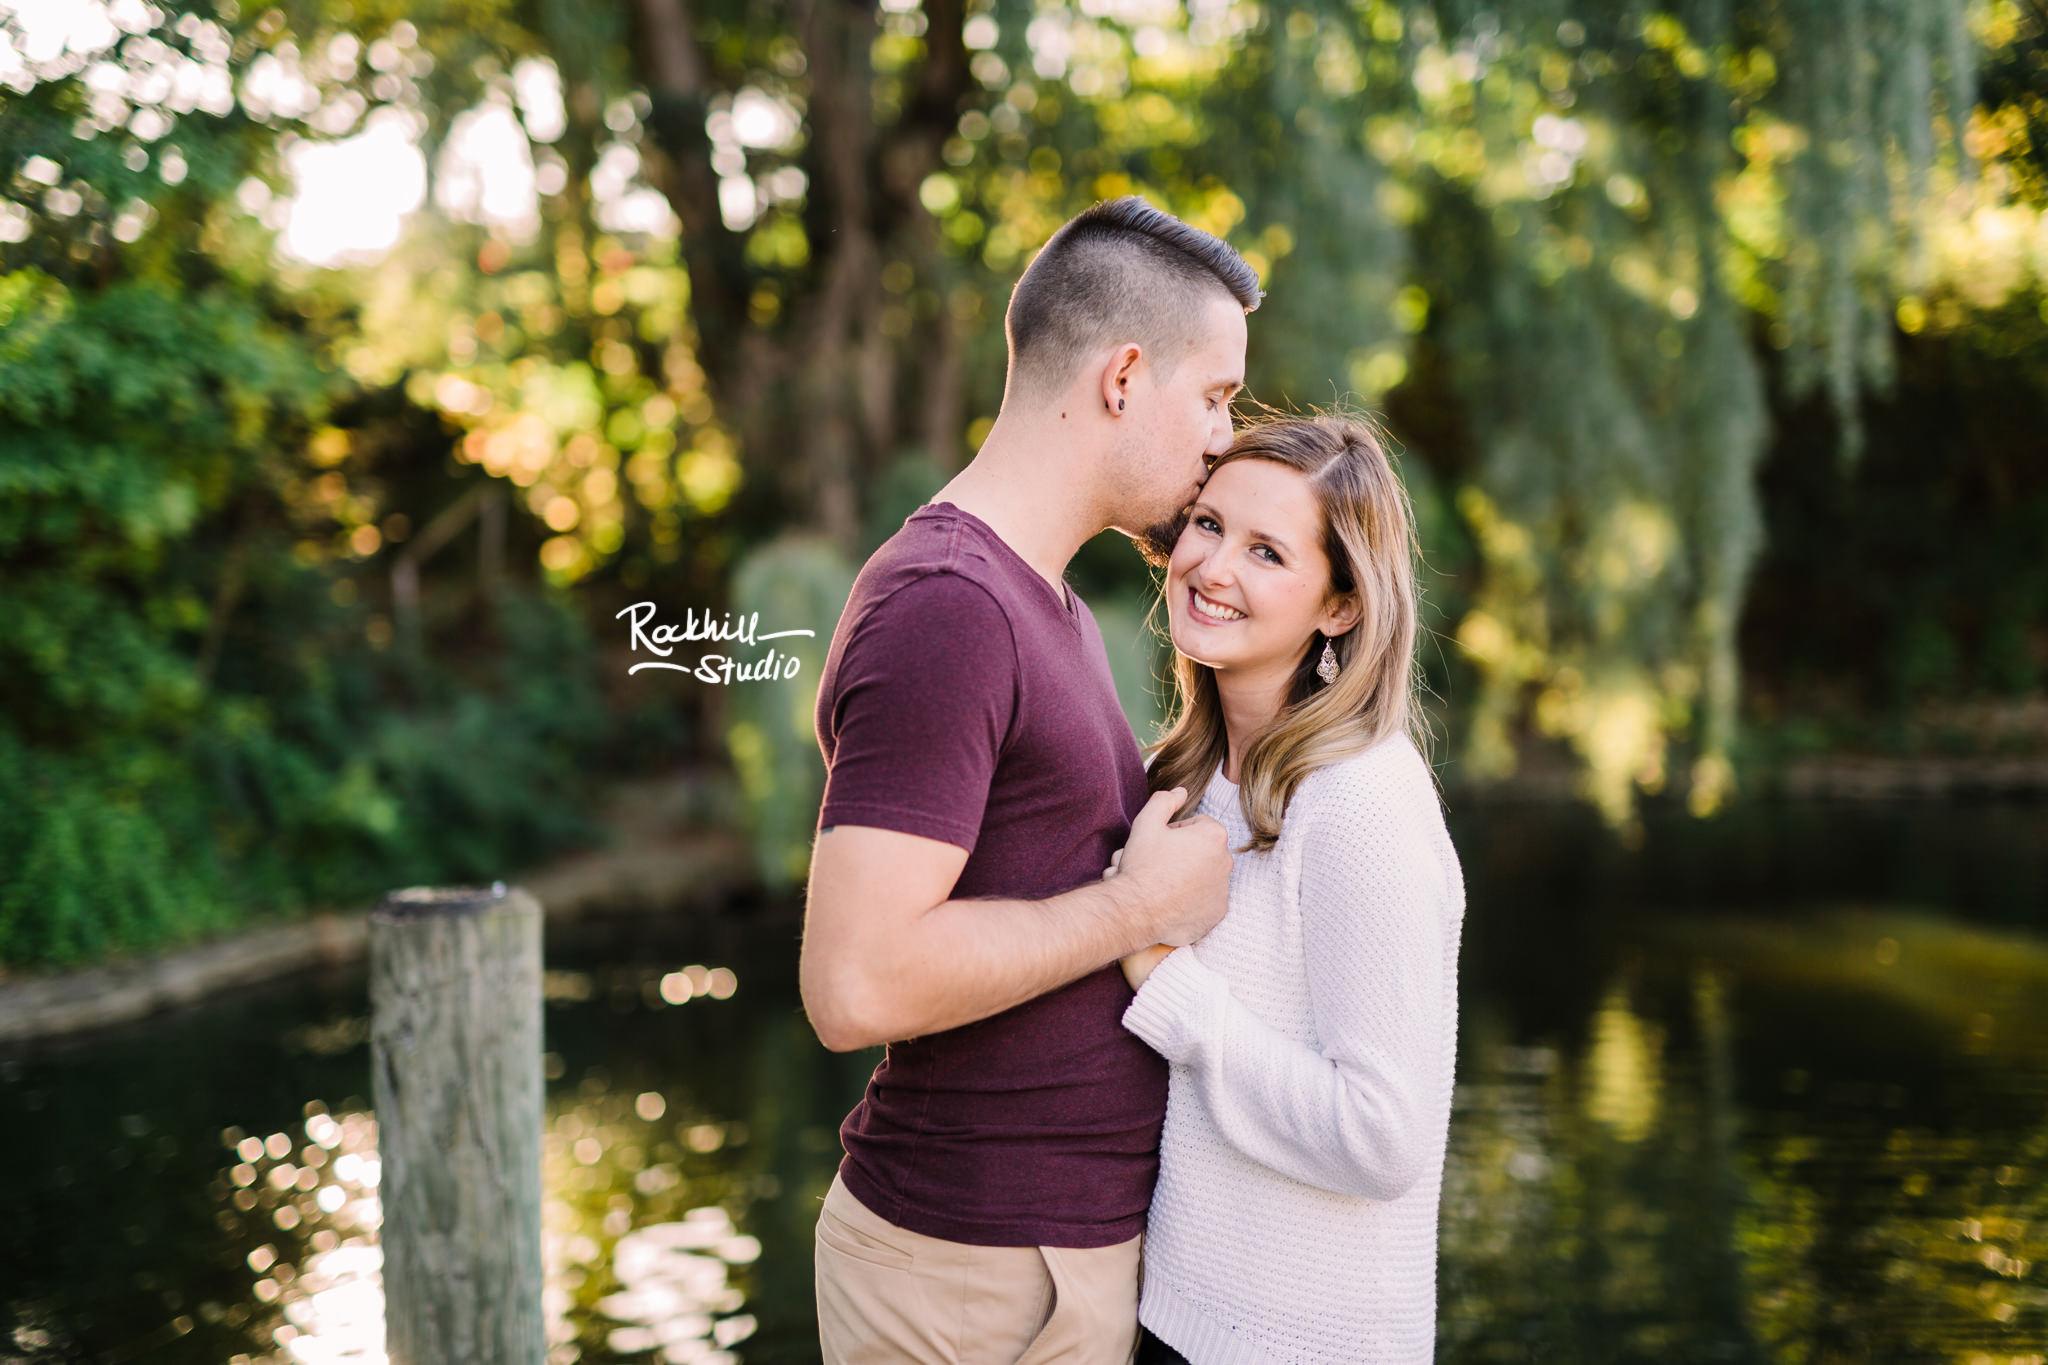 Traverse City Engagement and wedding photography, Rockhill Studio